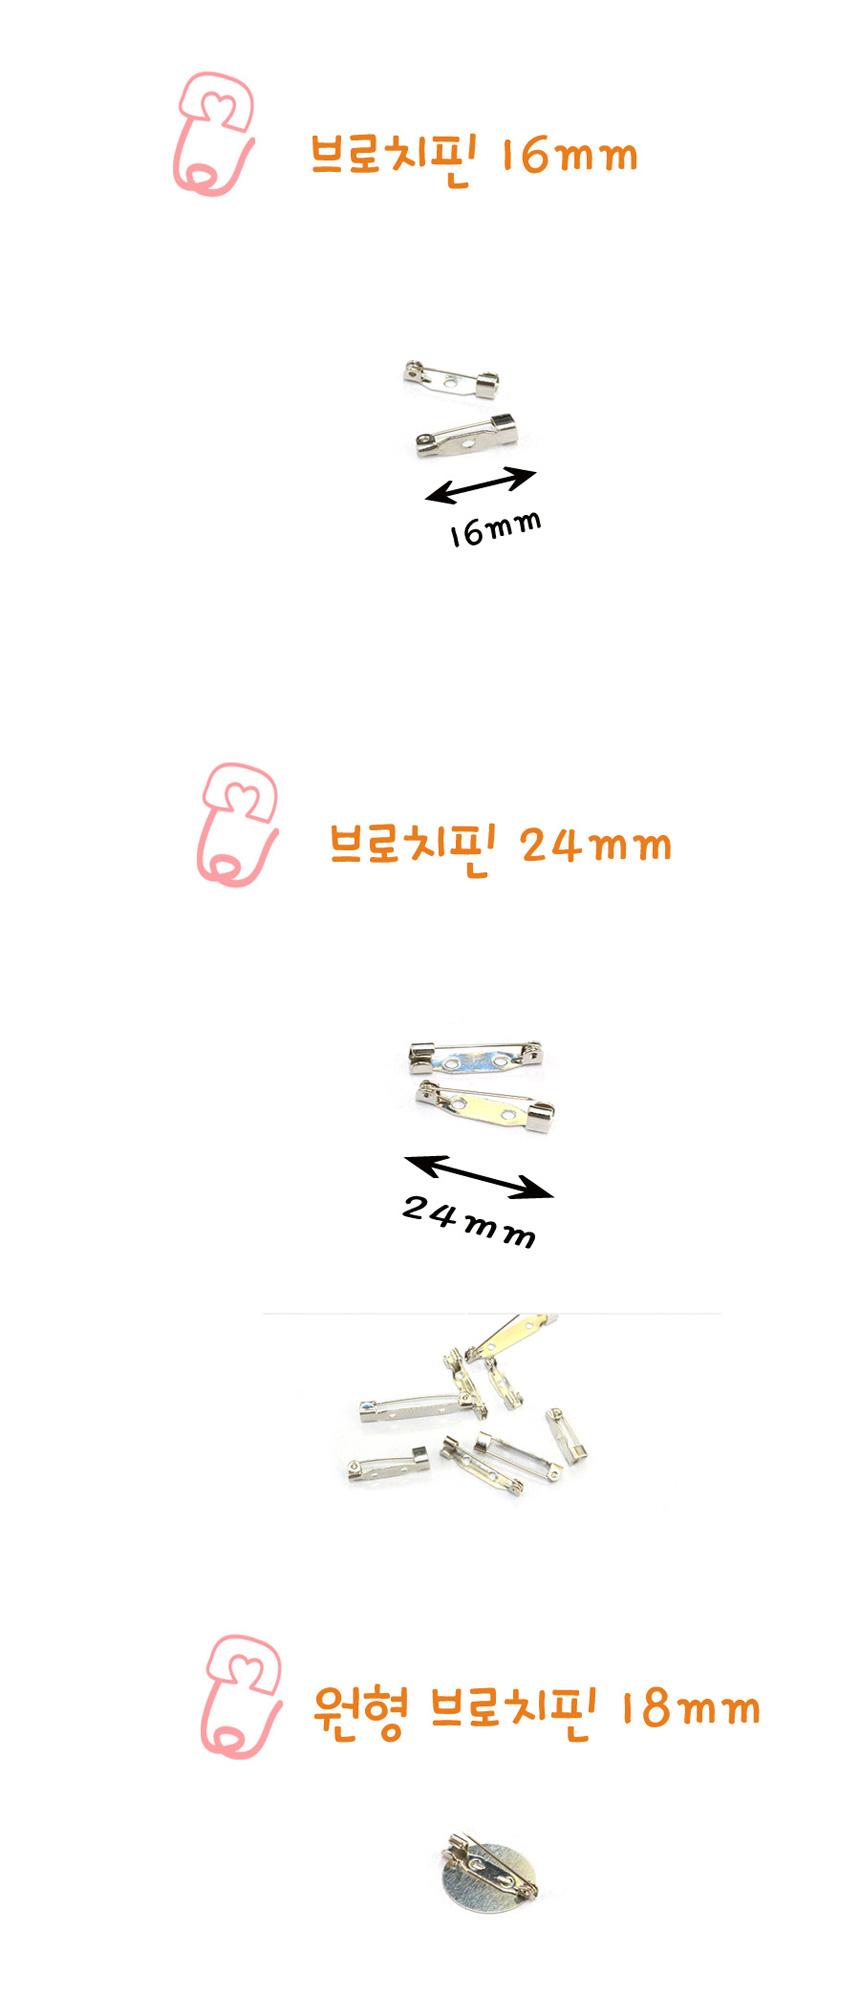 16mm 브로치핀 5ea - 홈질, 1,000원, 퀼트/원단공예, 펜/핀/부자재